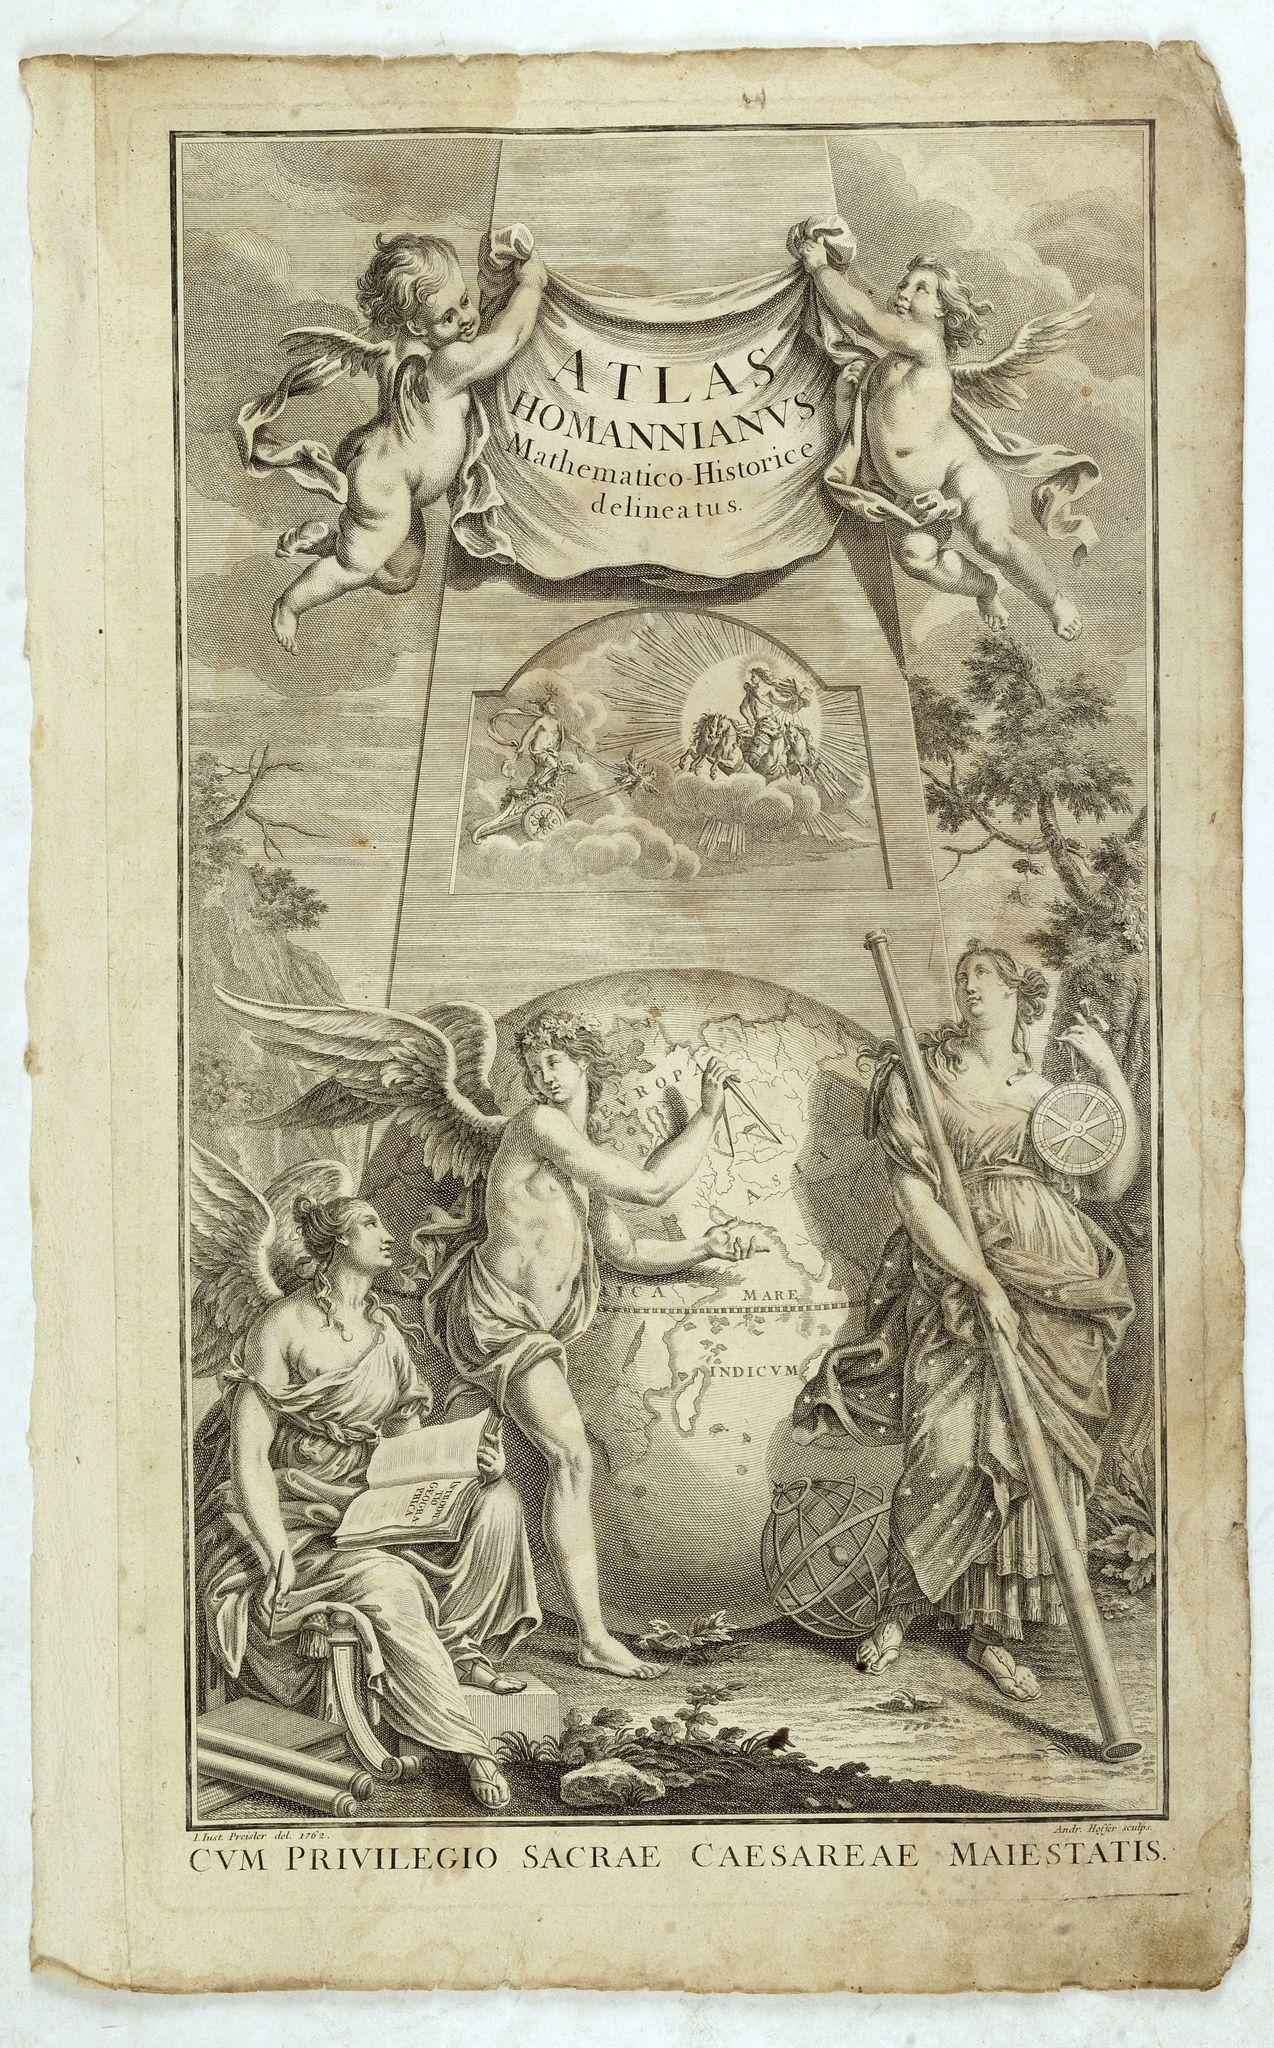 HOMANN, J.B. -  [Titlepage]  Atlas Homannianus Mathematico Historice delineatus.